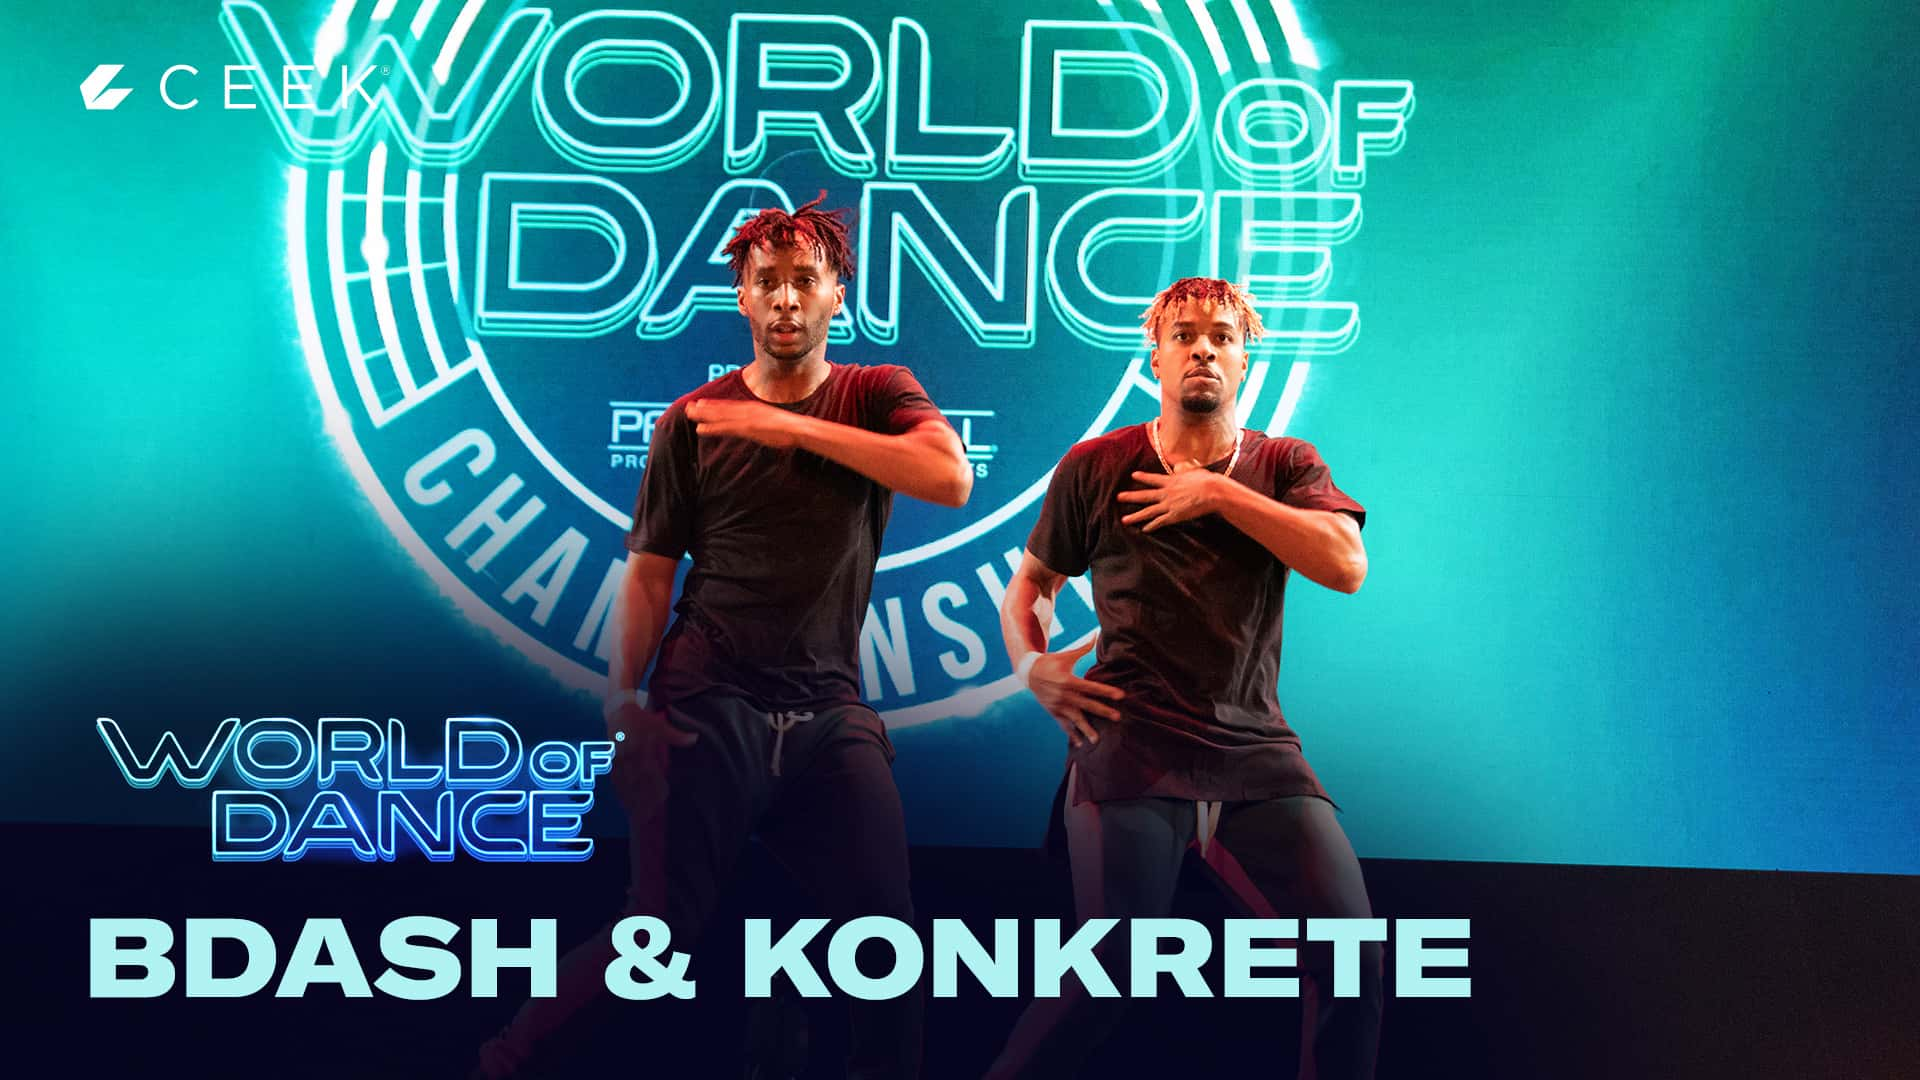 Bdash & Konkrete ceek.com